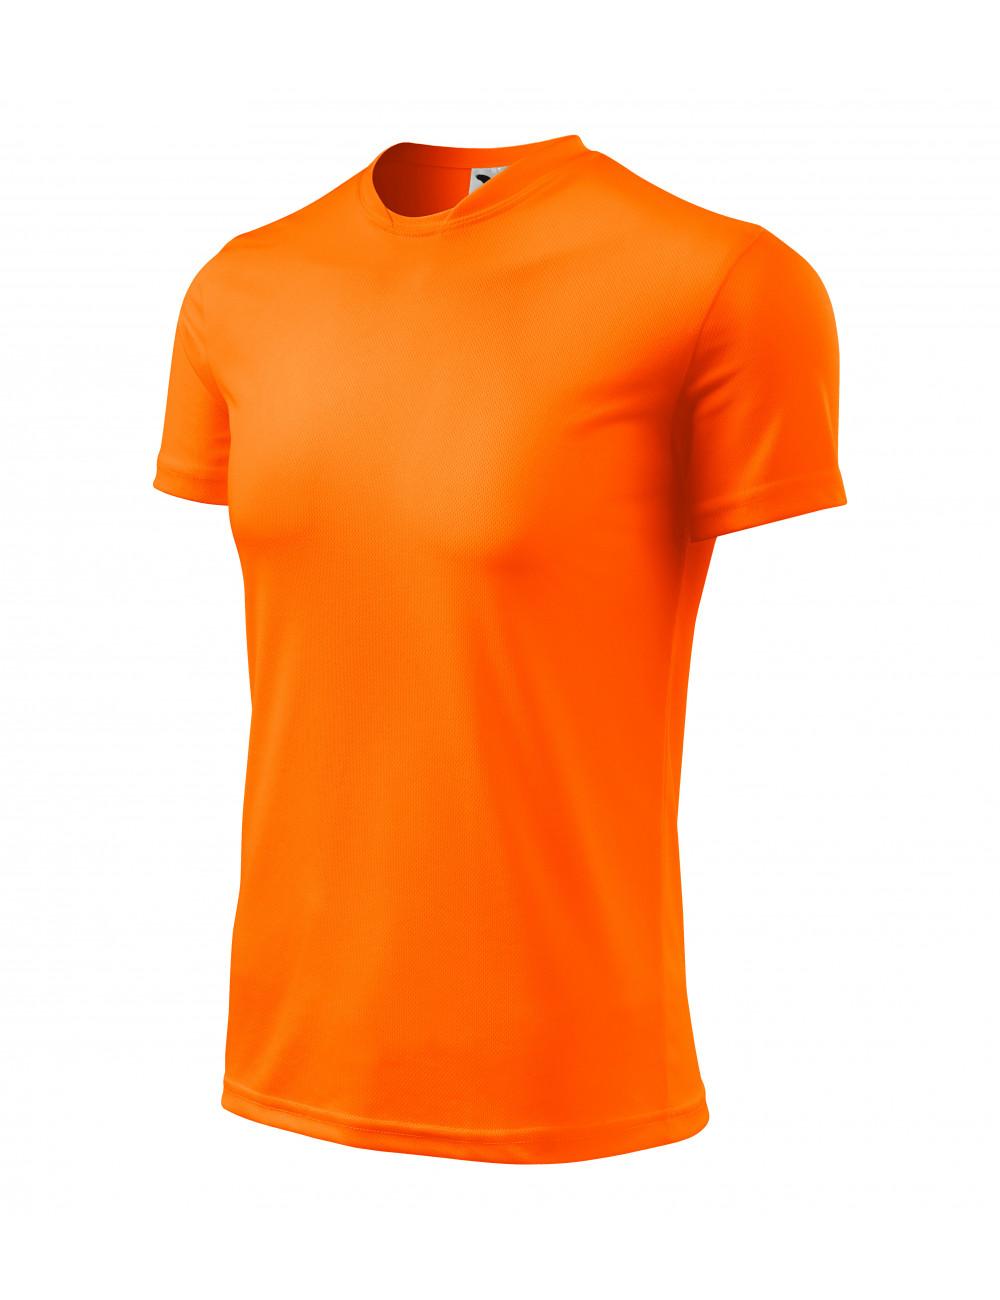 Adler MALFINI Koszulka dziecięca Fantasy 147 neon orange